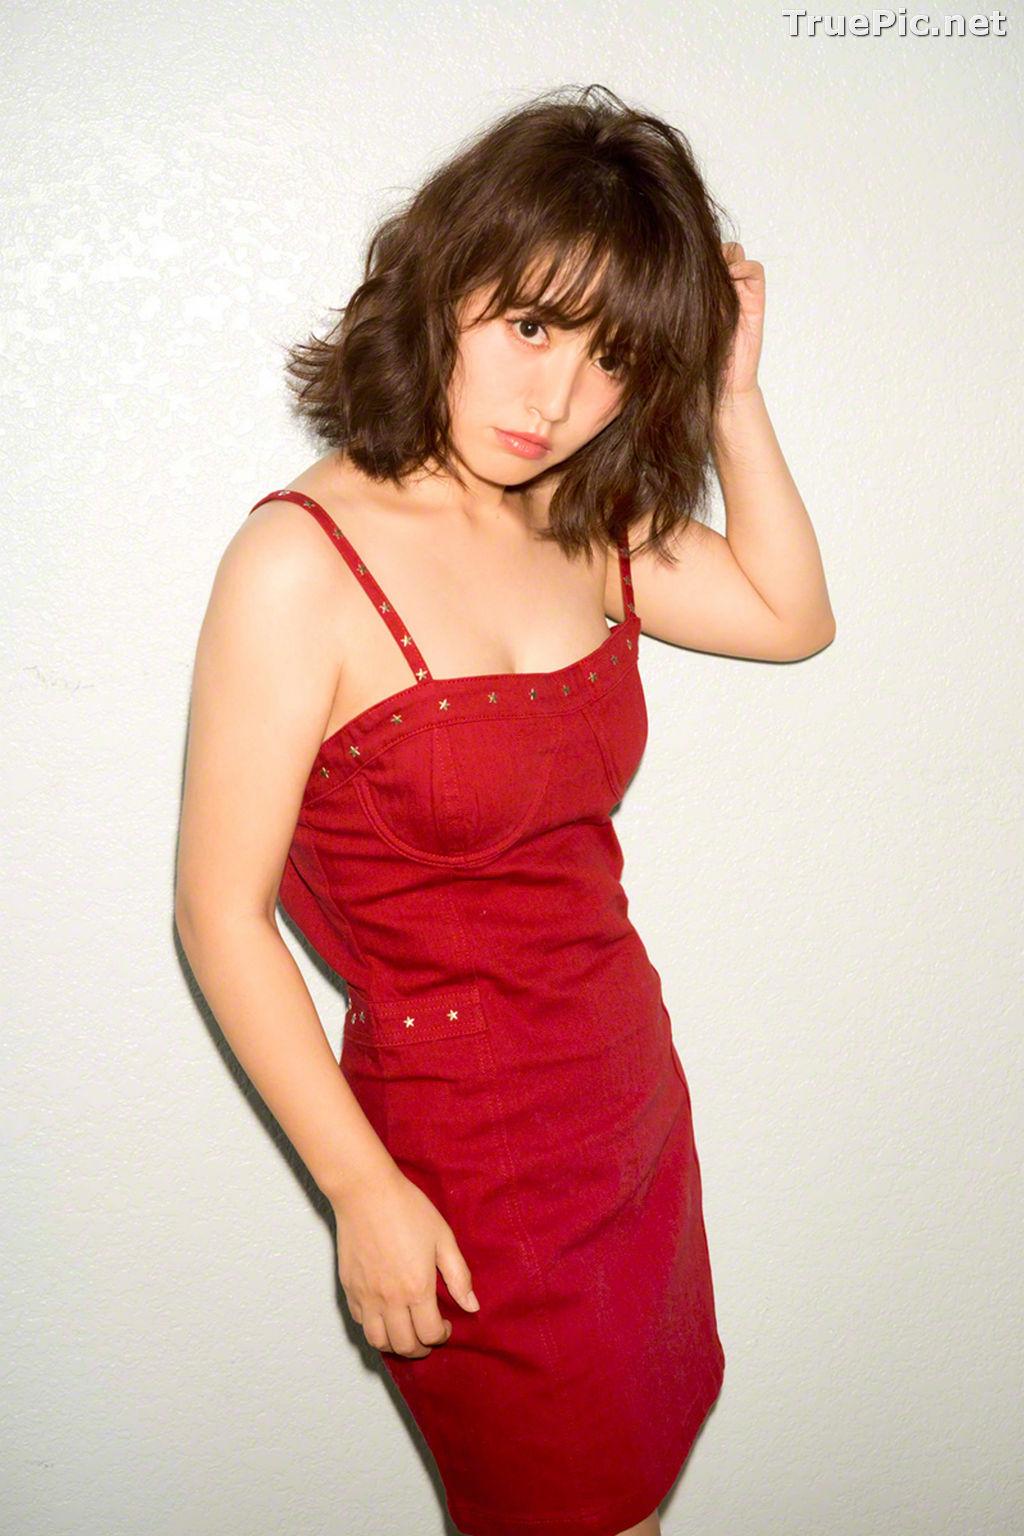 Image Wanibooks No.141 – Japanese Actress and Gravure Idol – Sayaka Isoyama - TruePic.net - Picture-3